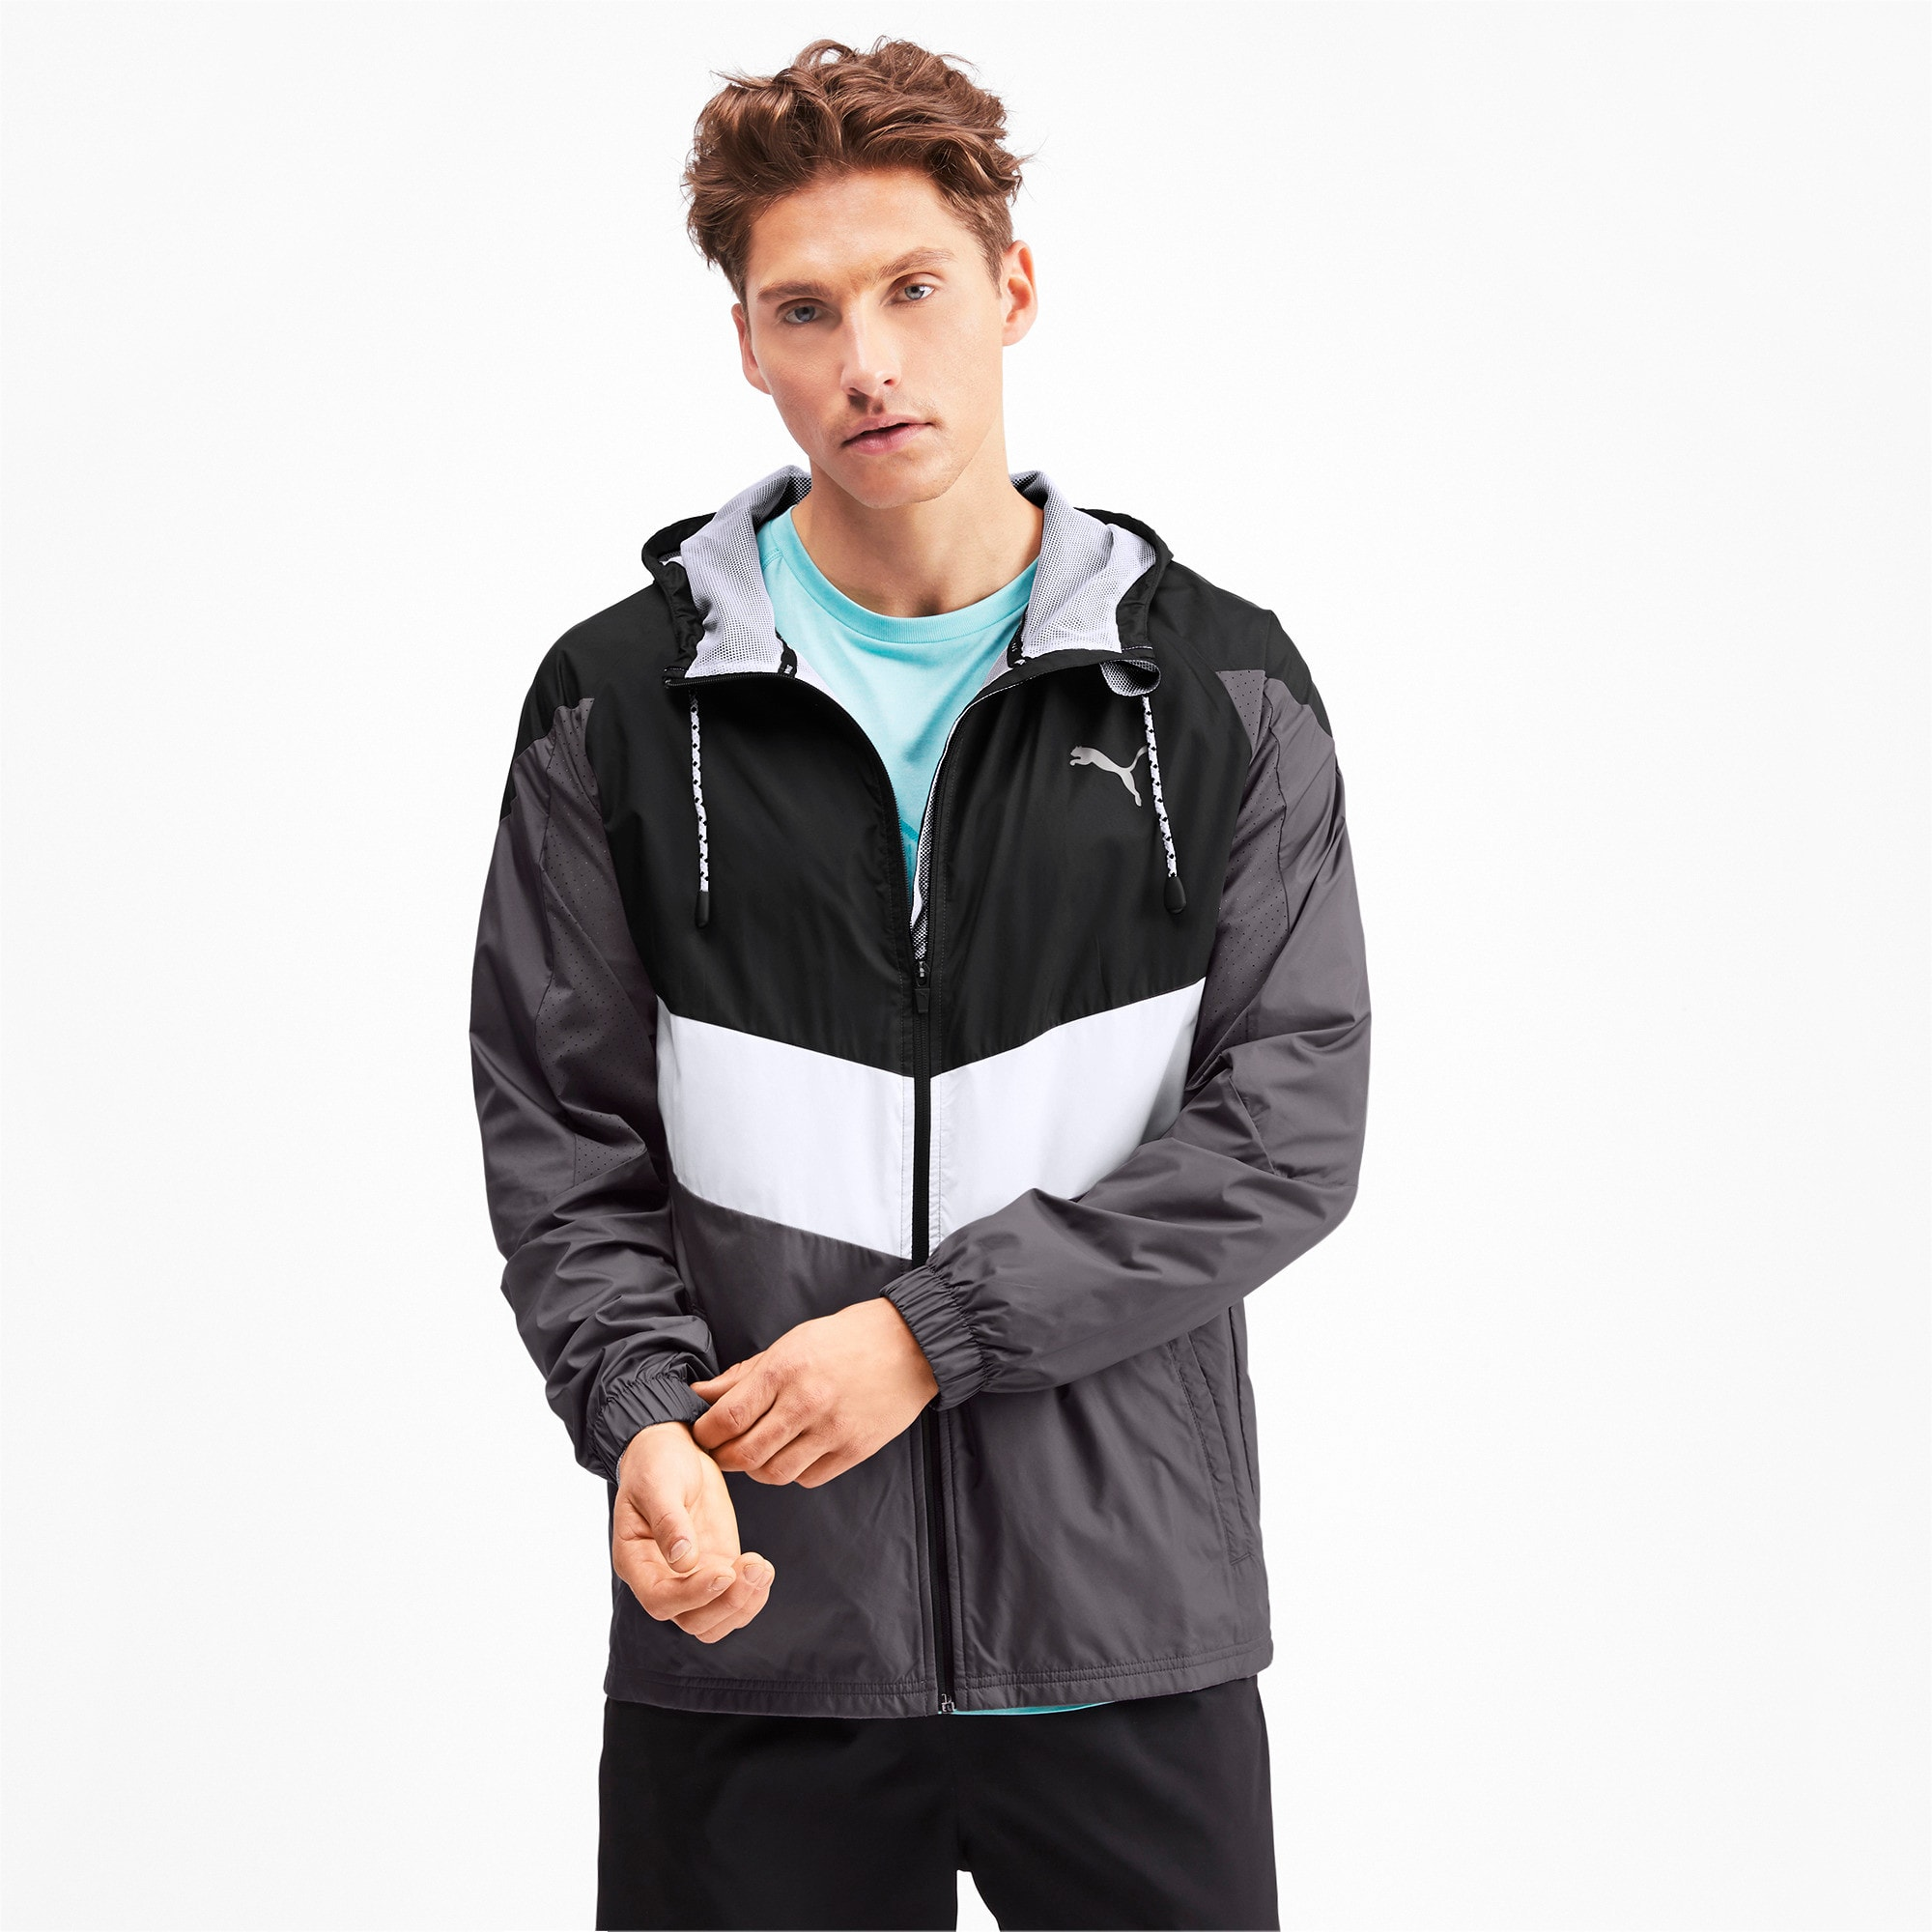 Thumbnail 1 of Reactive Woven Men's Training Jacket, Black-CASTLEROCK-White, medium